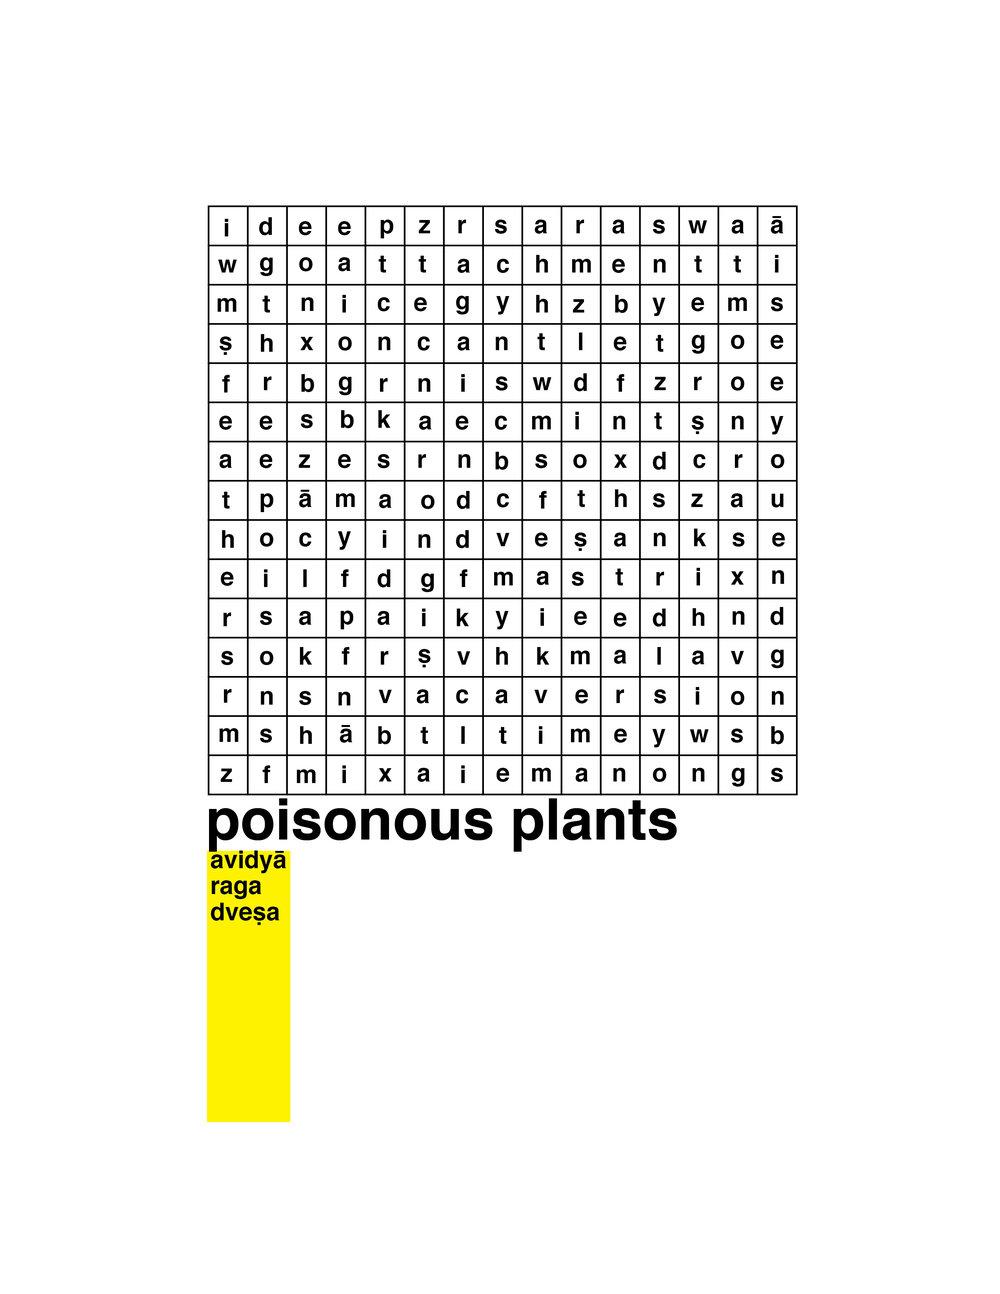 poisonousplantsforef-01.jpg